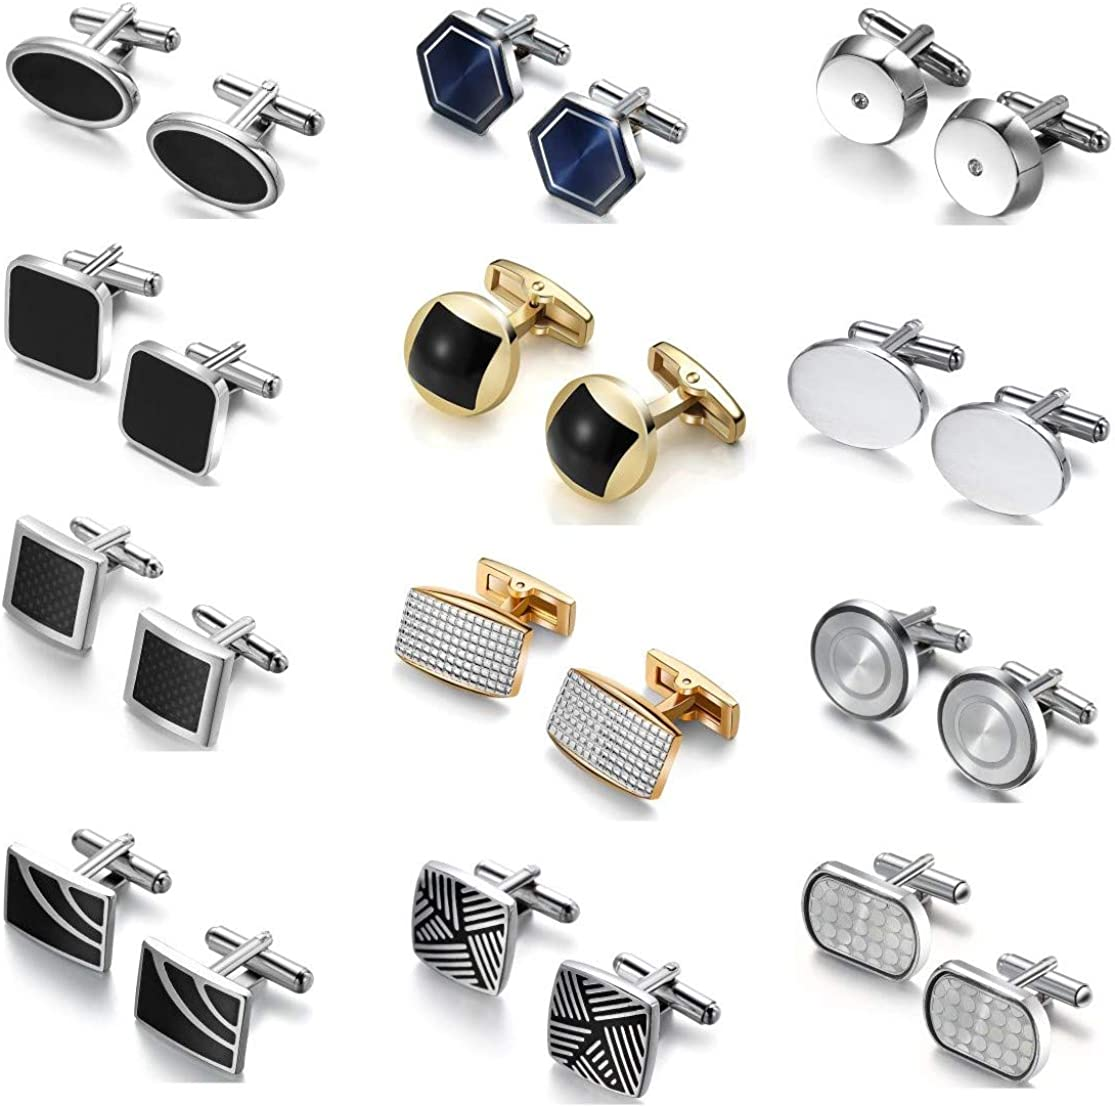 DORICUFF Save money Cufflinks for Men Gift Elegan Simple Set Stylish 67% OFF of fixed price Modern